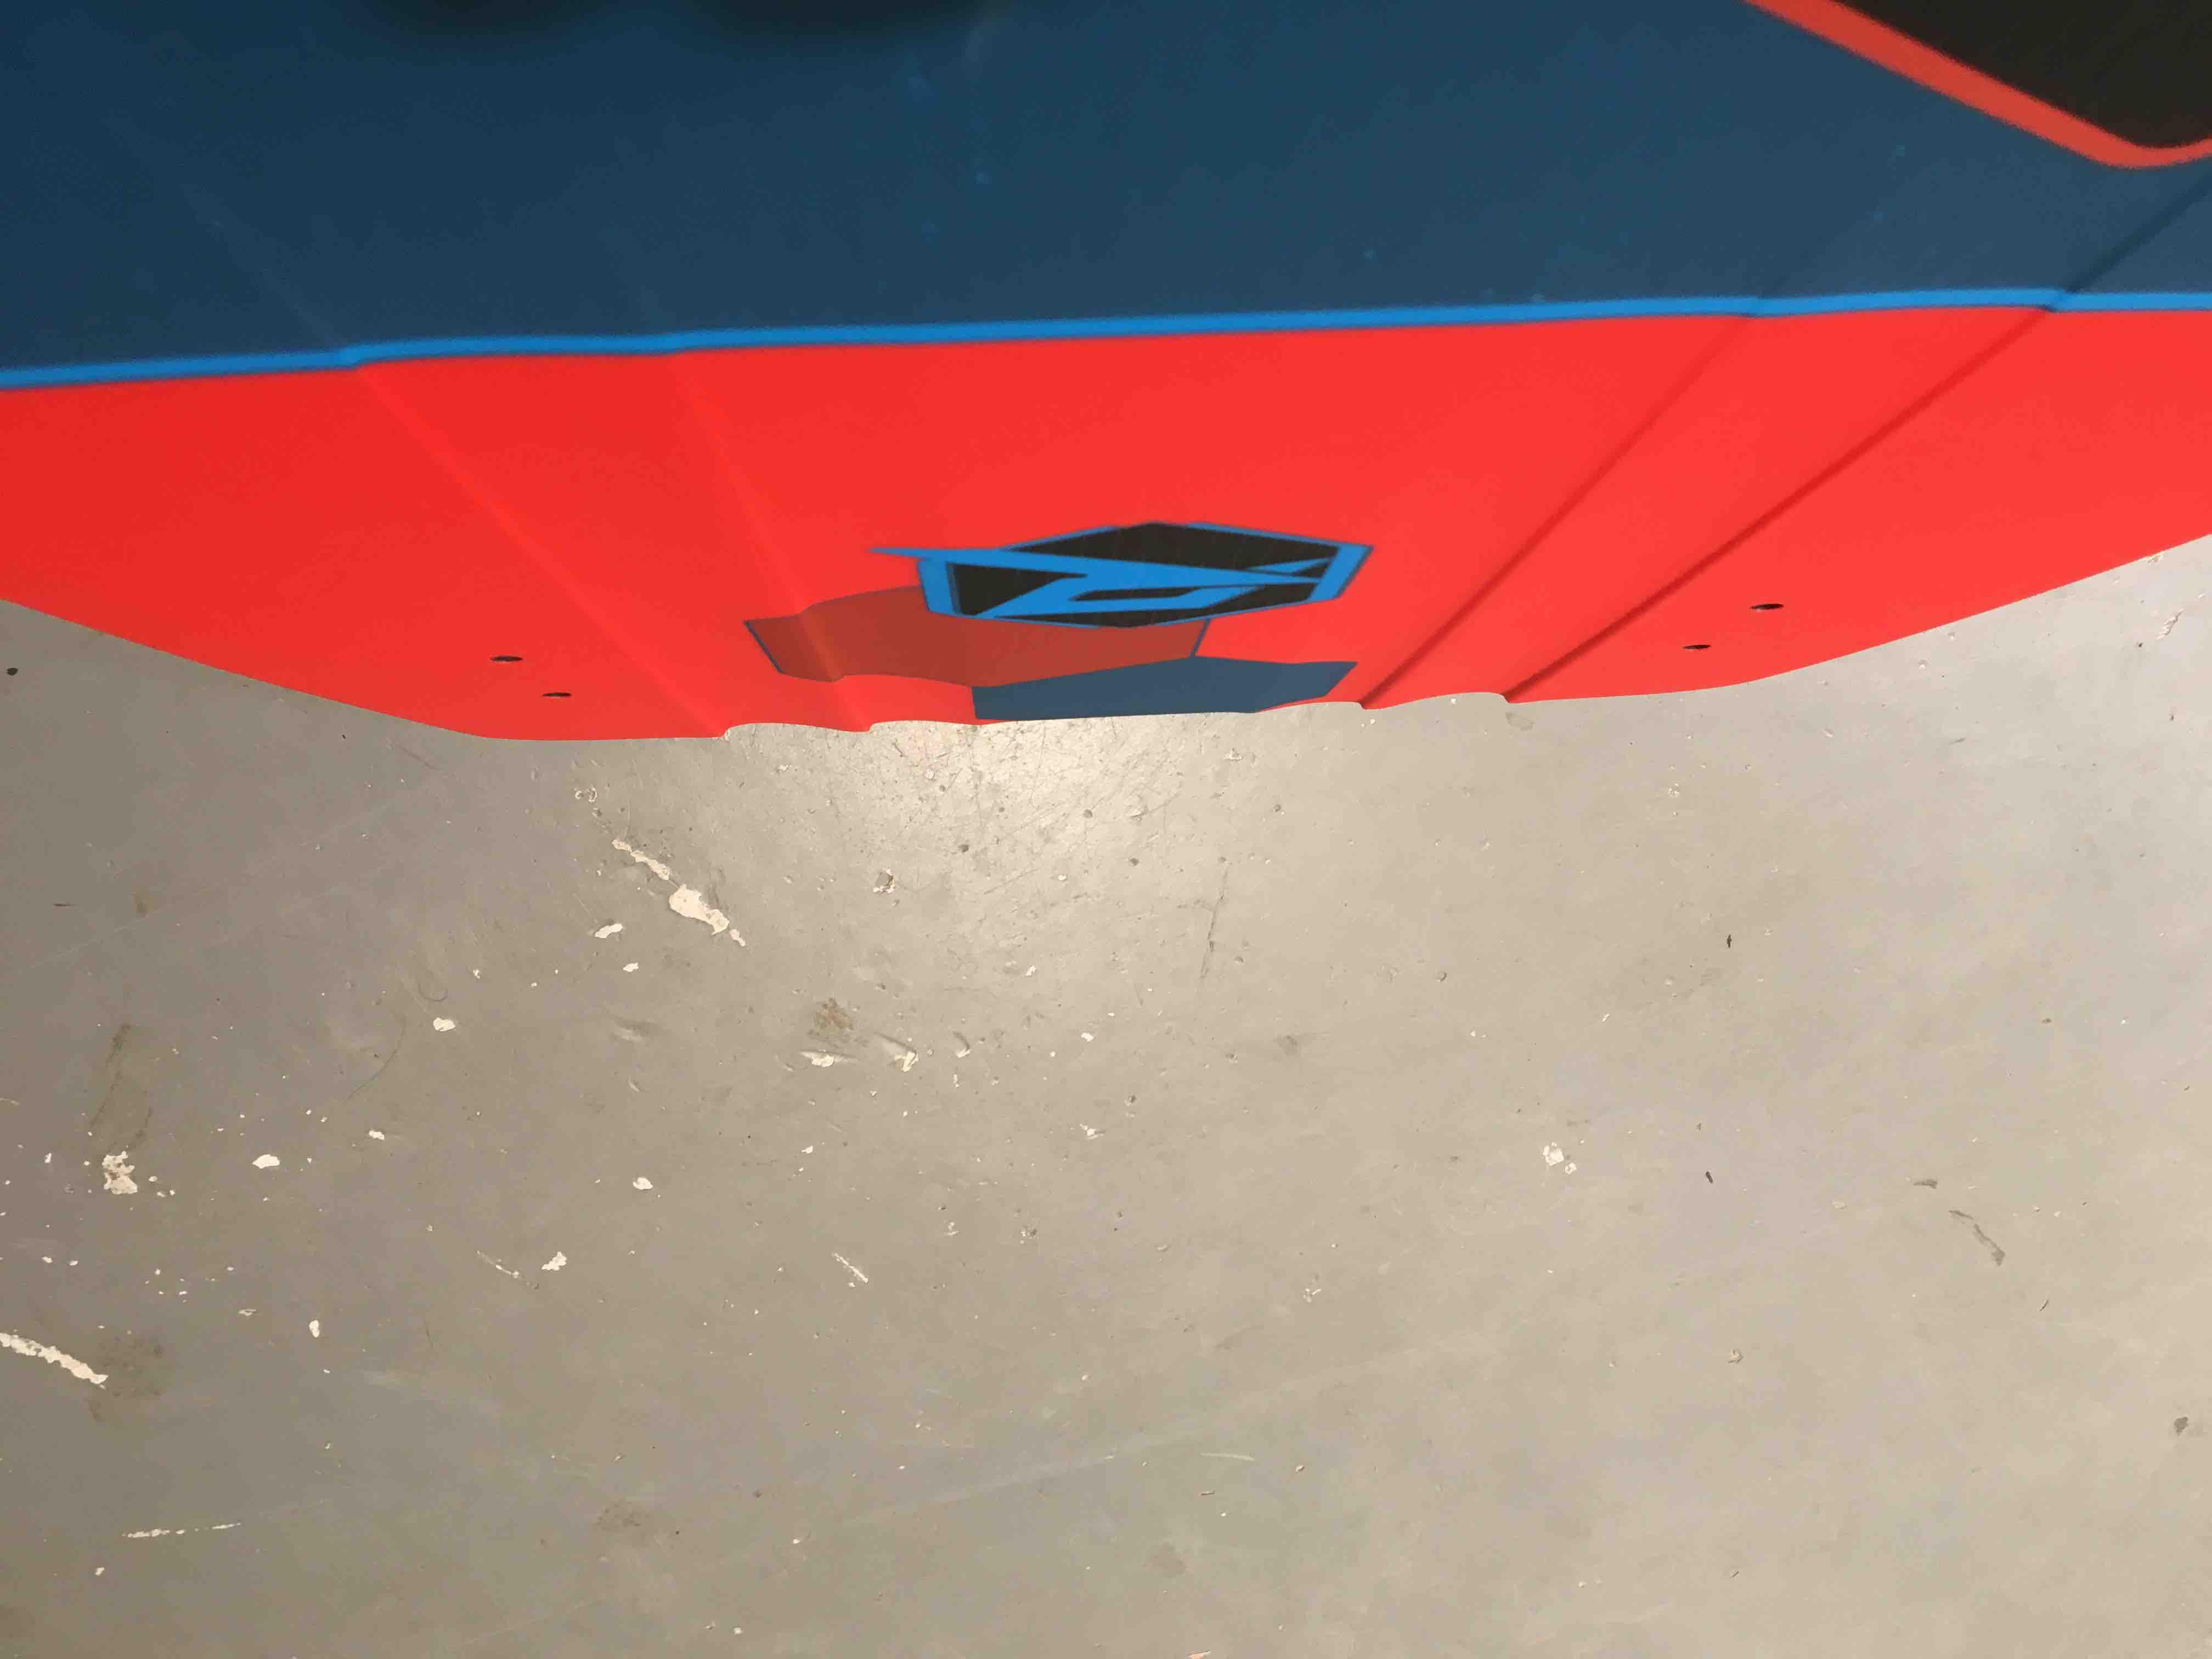 Planche Twin-Tip Kitesurf RSC Supreme Pro 2018 The Corner Shop_2